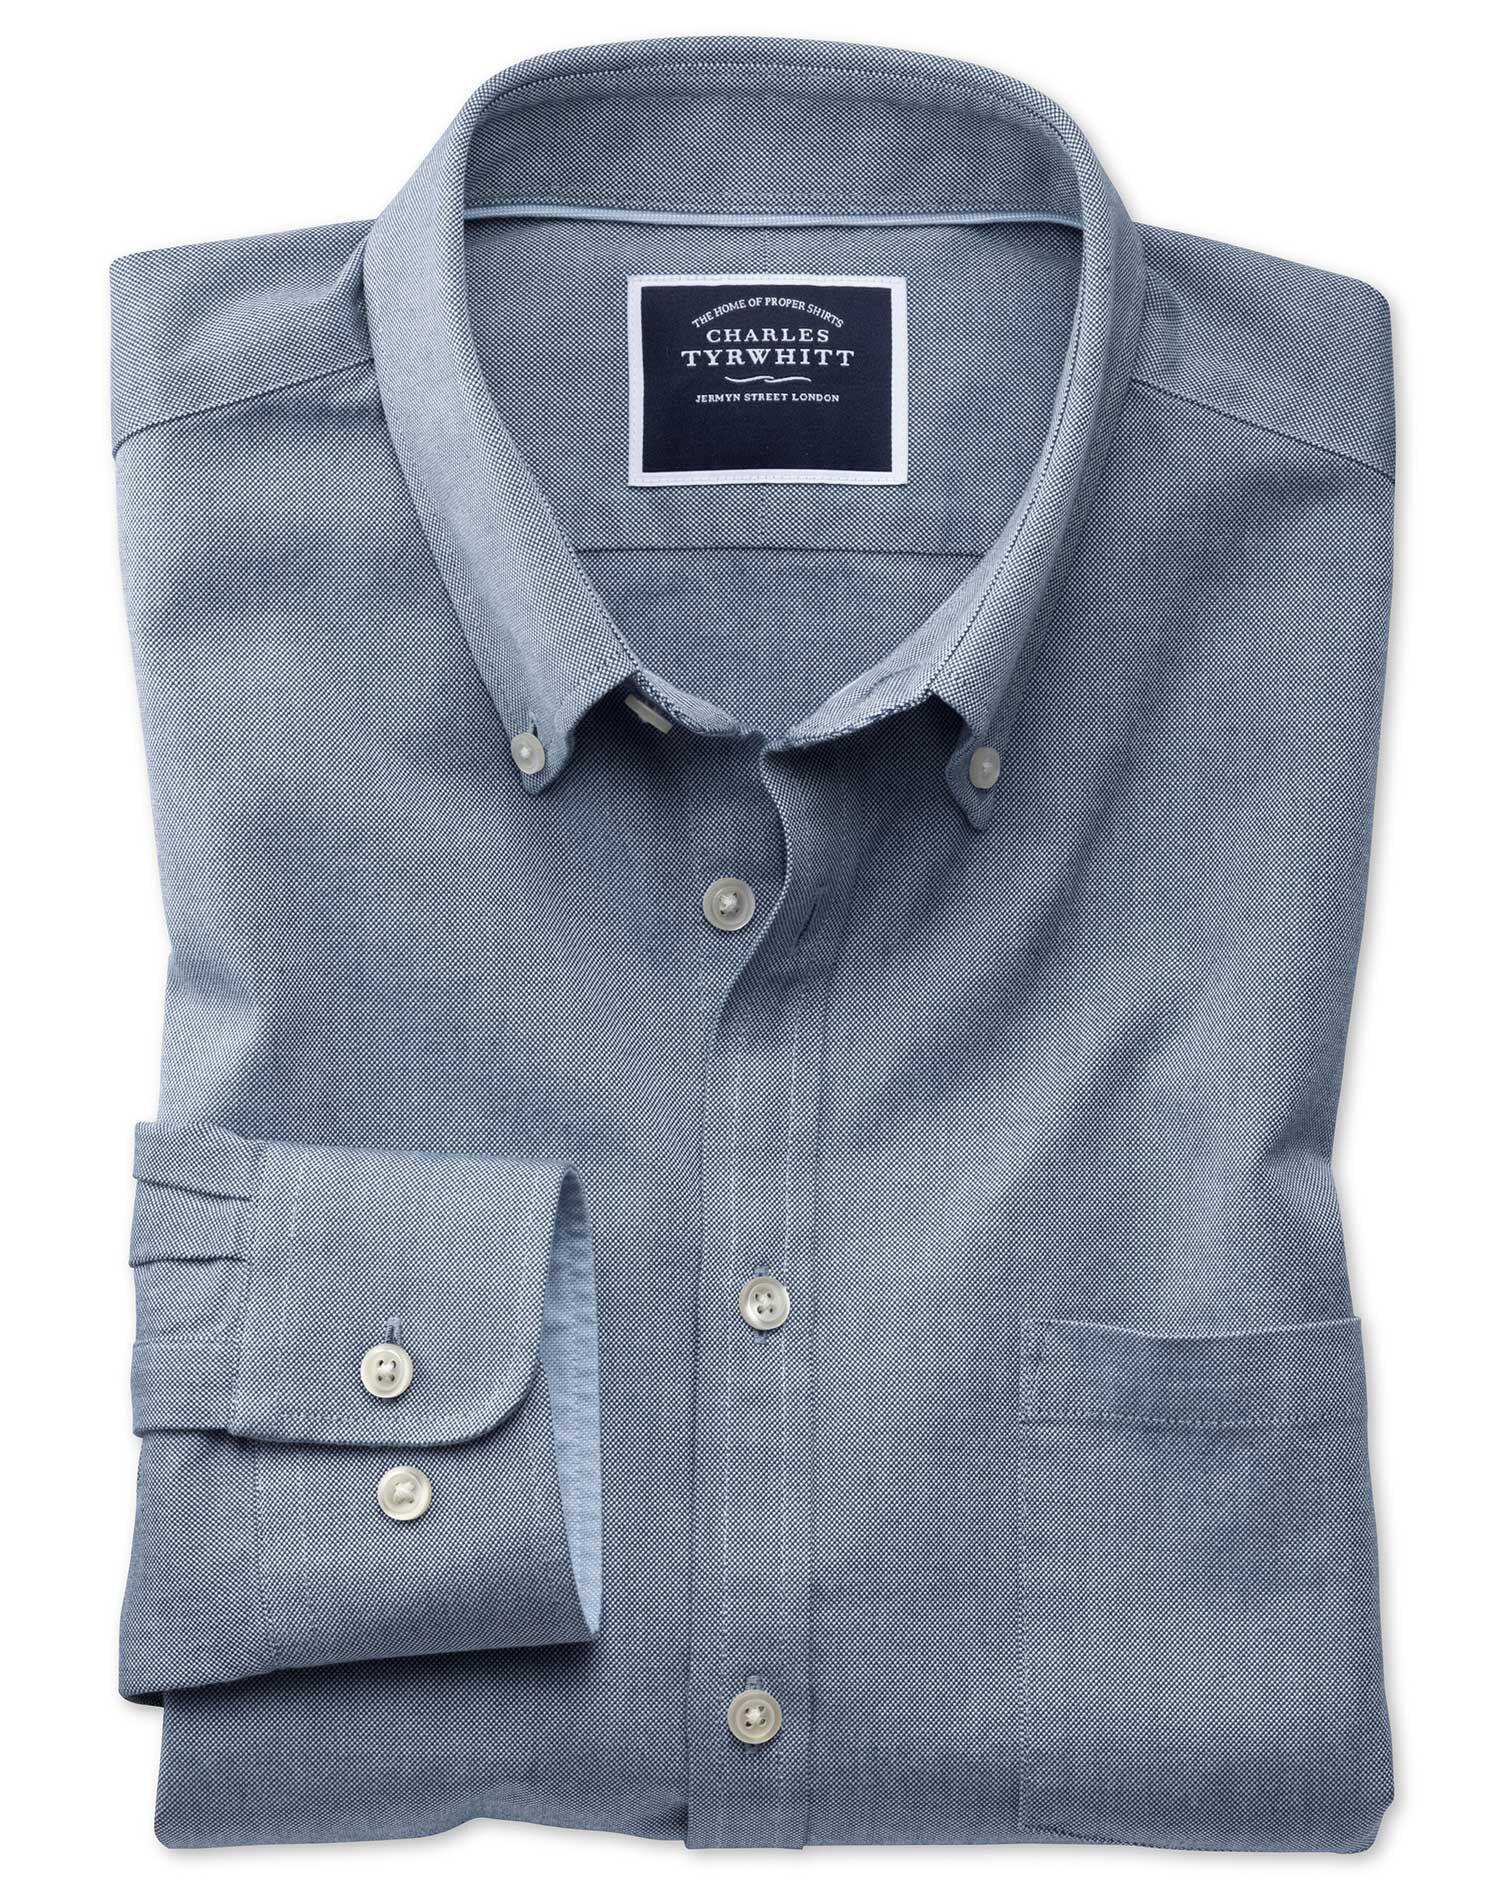 Slim Fit Button-Down Washed Oxford Plain Indigo Blue Cotton Shirt Single Cuff Size XL by Charles Tyr